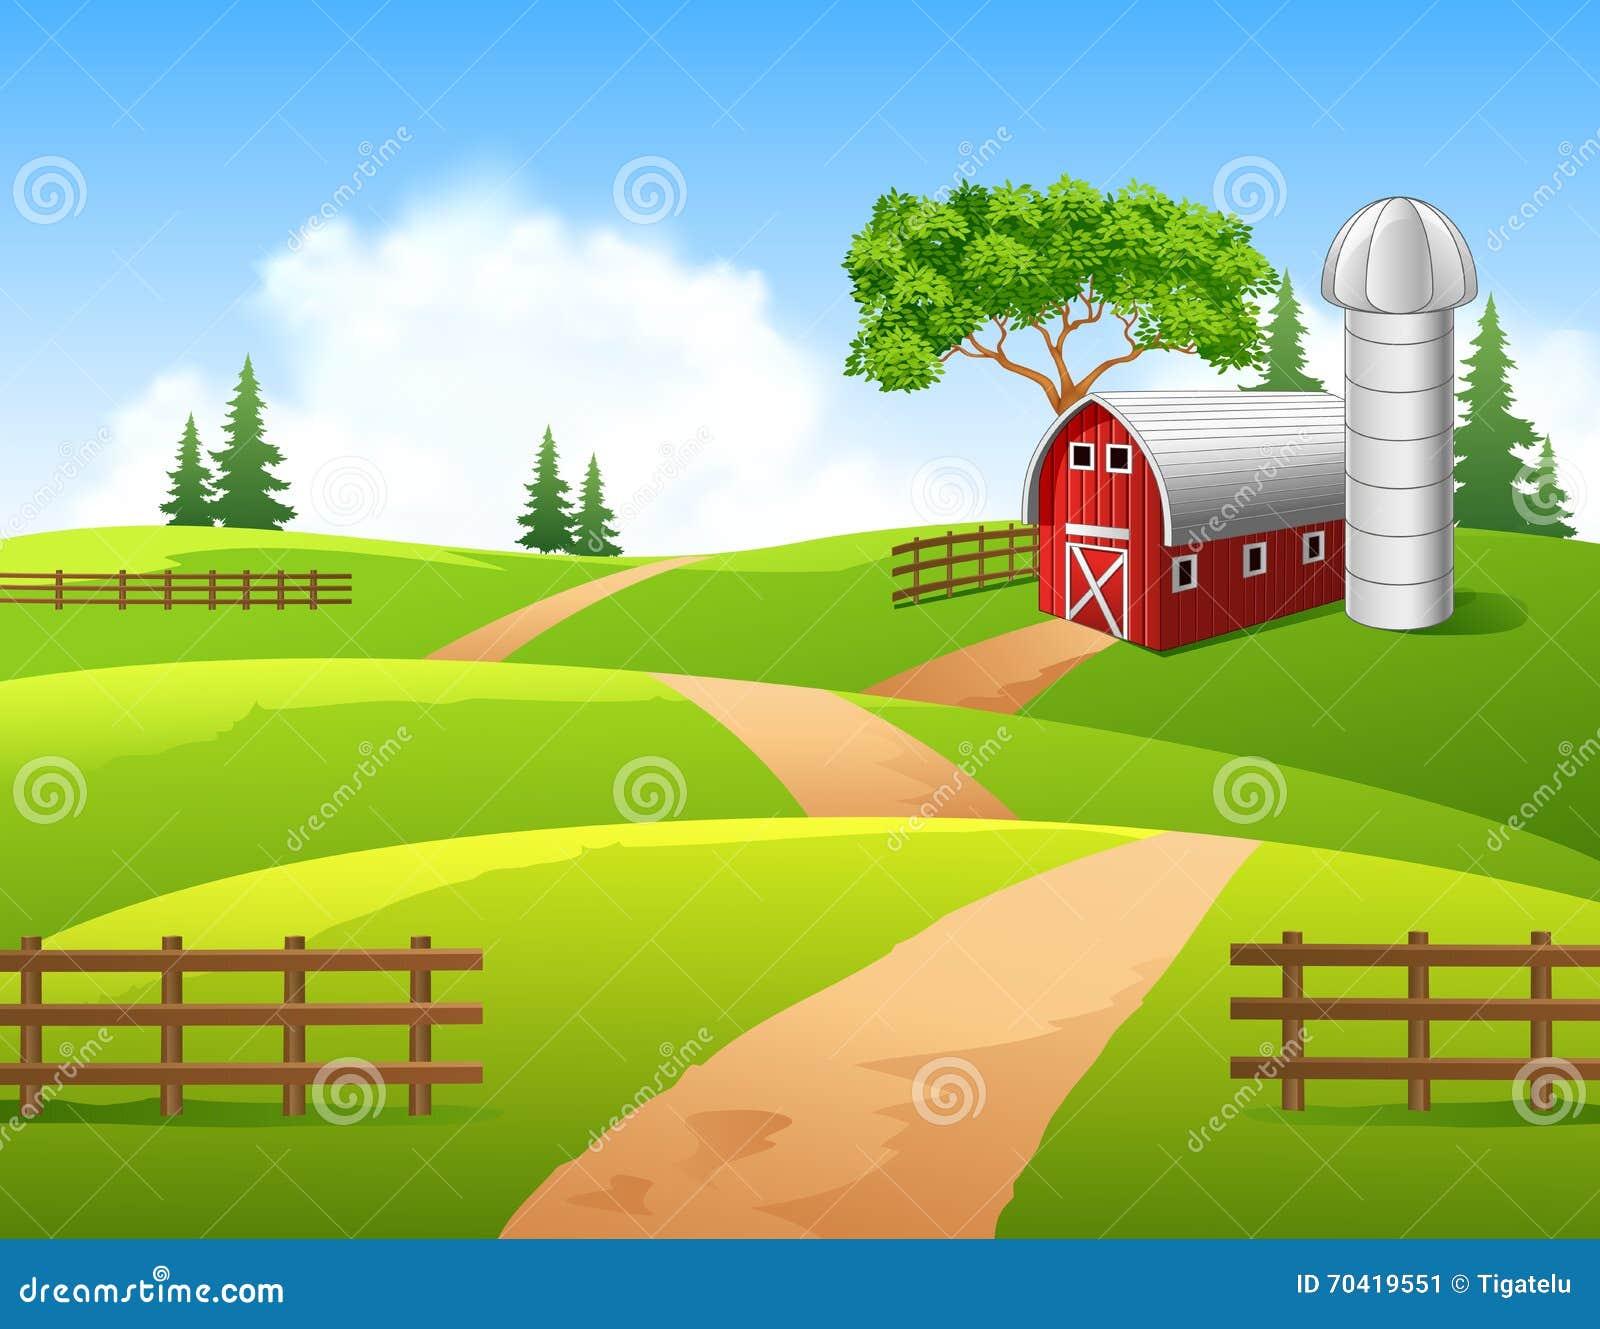 Free Barn Plans Cartoon Illustration Of Farm Background Stock Vector